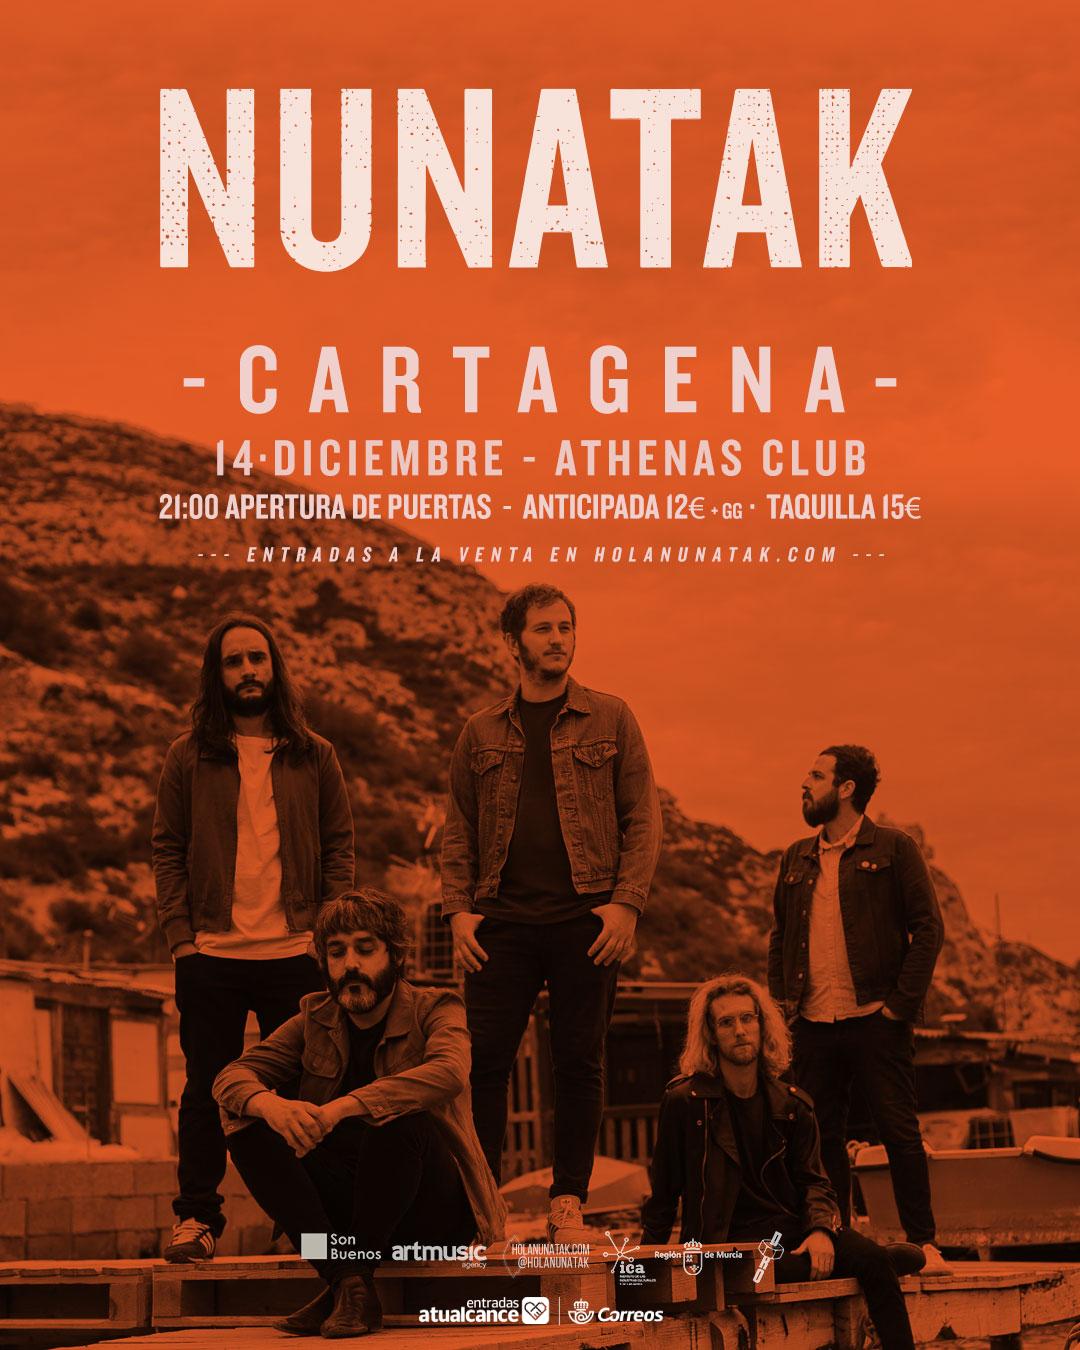 nunatak-en-cartagena-5ce4079f0a048.jpeg